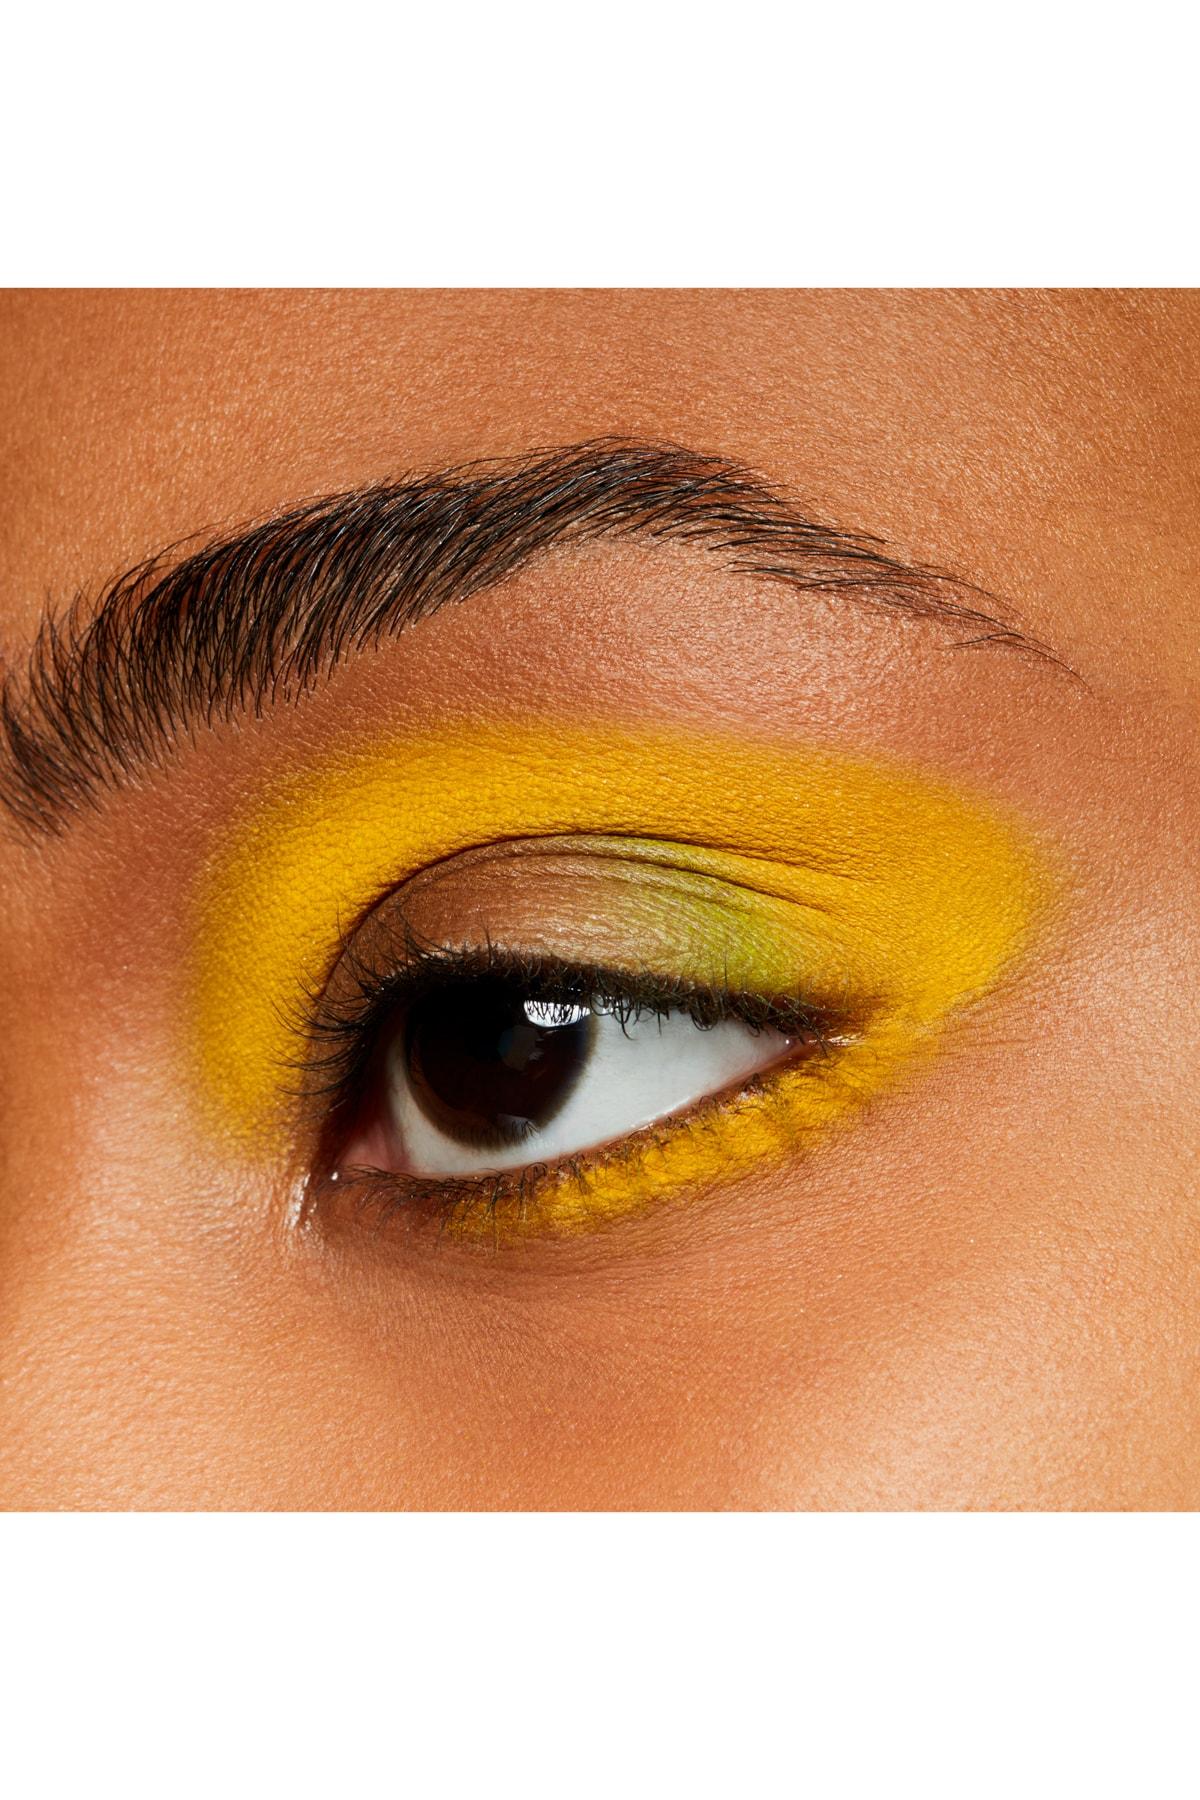 M.A.C Göz Farı - Eye Shadow Chrome Yellow 1.5 g 773602001071 2